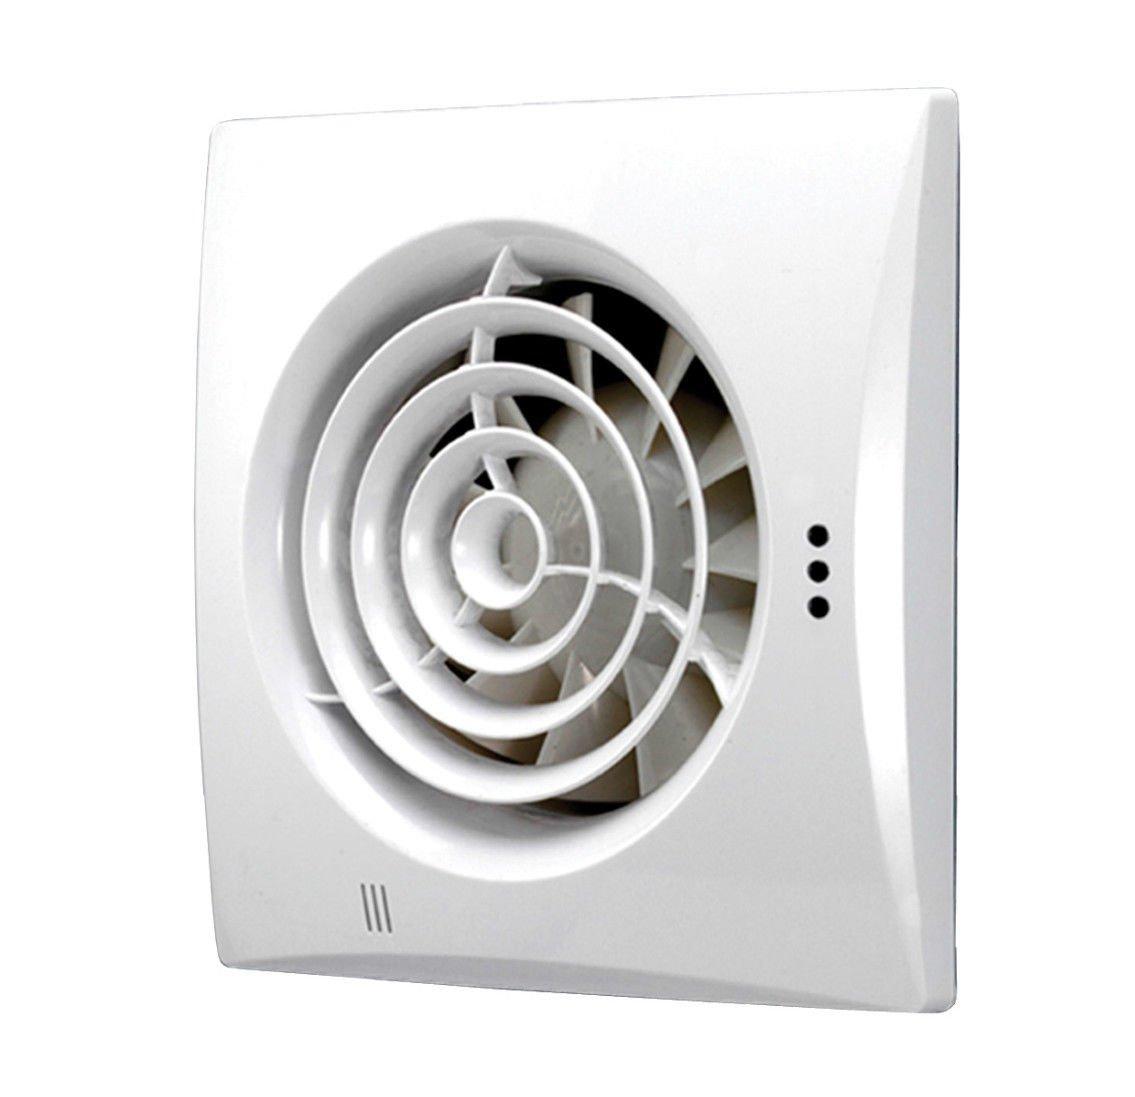 HIB-Hush-Timer-Wall-Fan-In-White